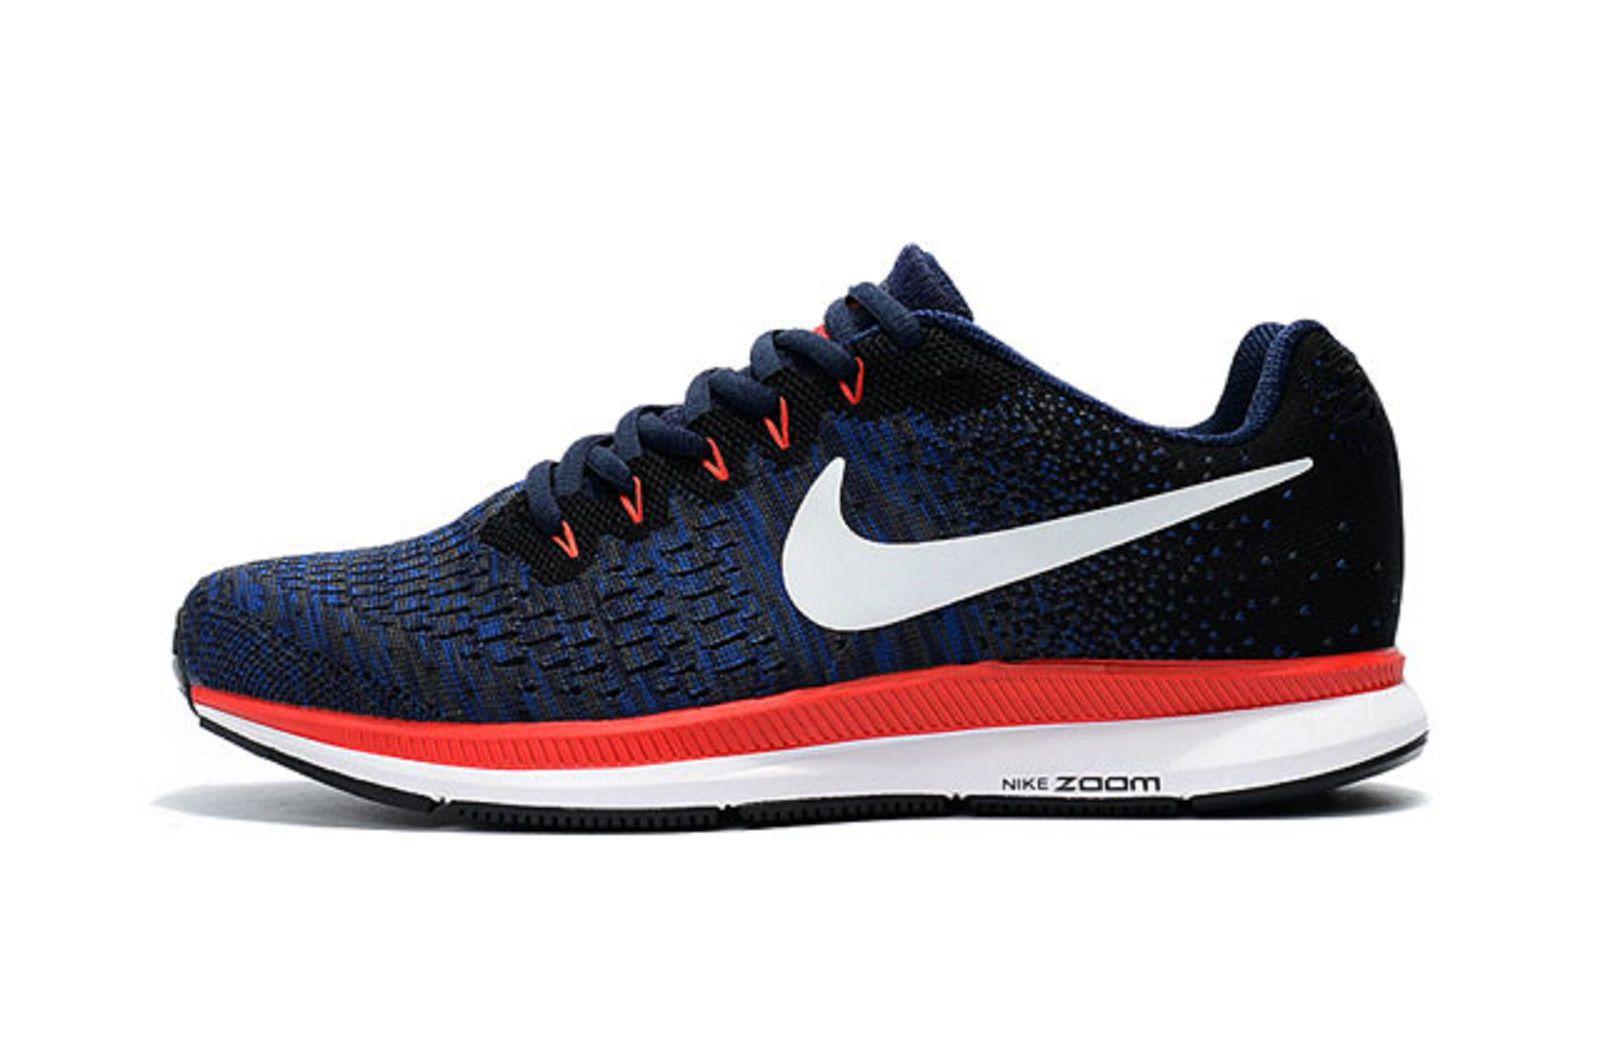 560ed6435f0a6 Nike Air Zoom Pegasus 33 Knite 2018 Blue Running Shoes - Buy Nike ...